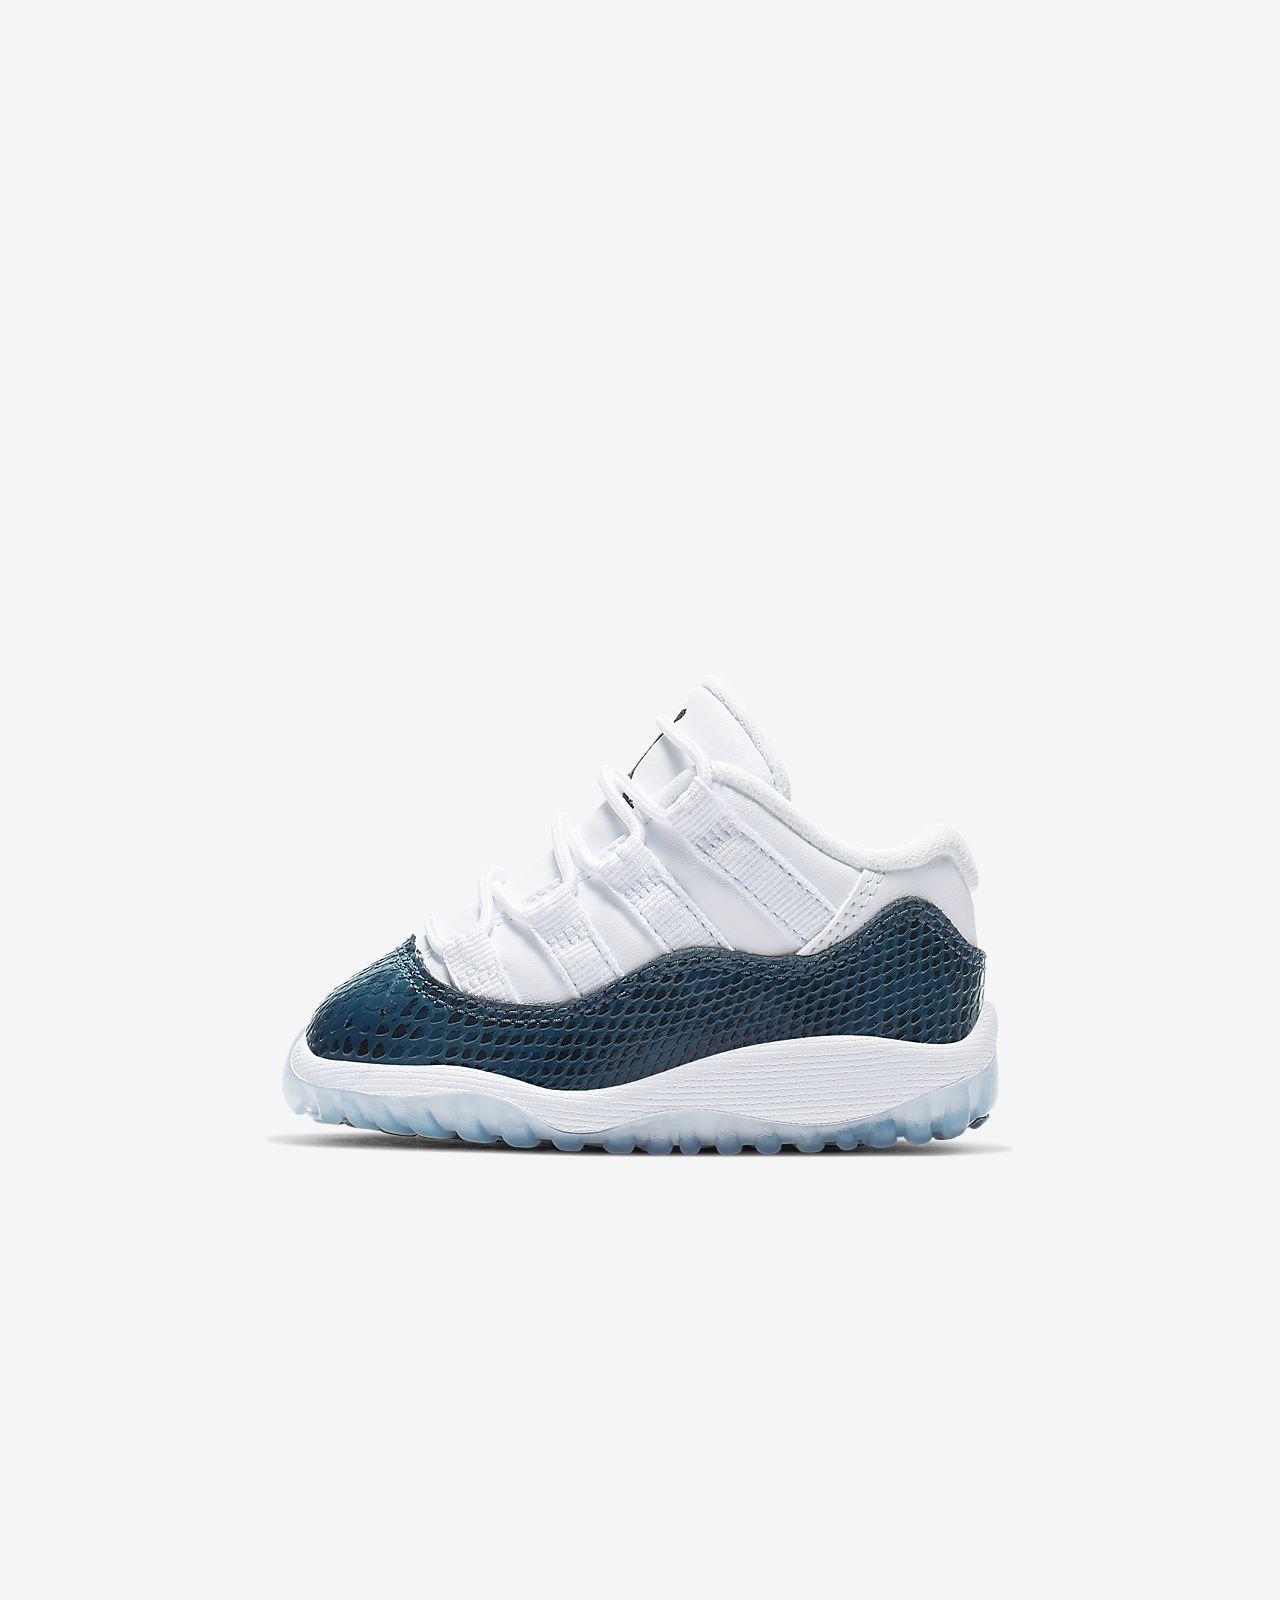 ea90d4fdc3e3 Jordan 11 Retro Low LE Baby Toddler Shoe. Nike.com SI